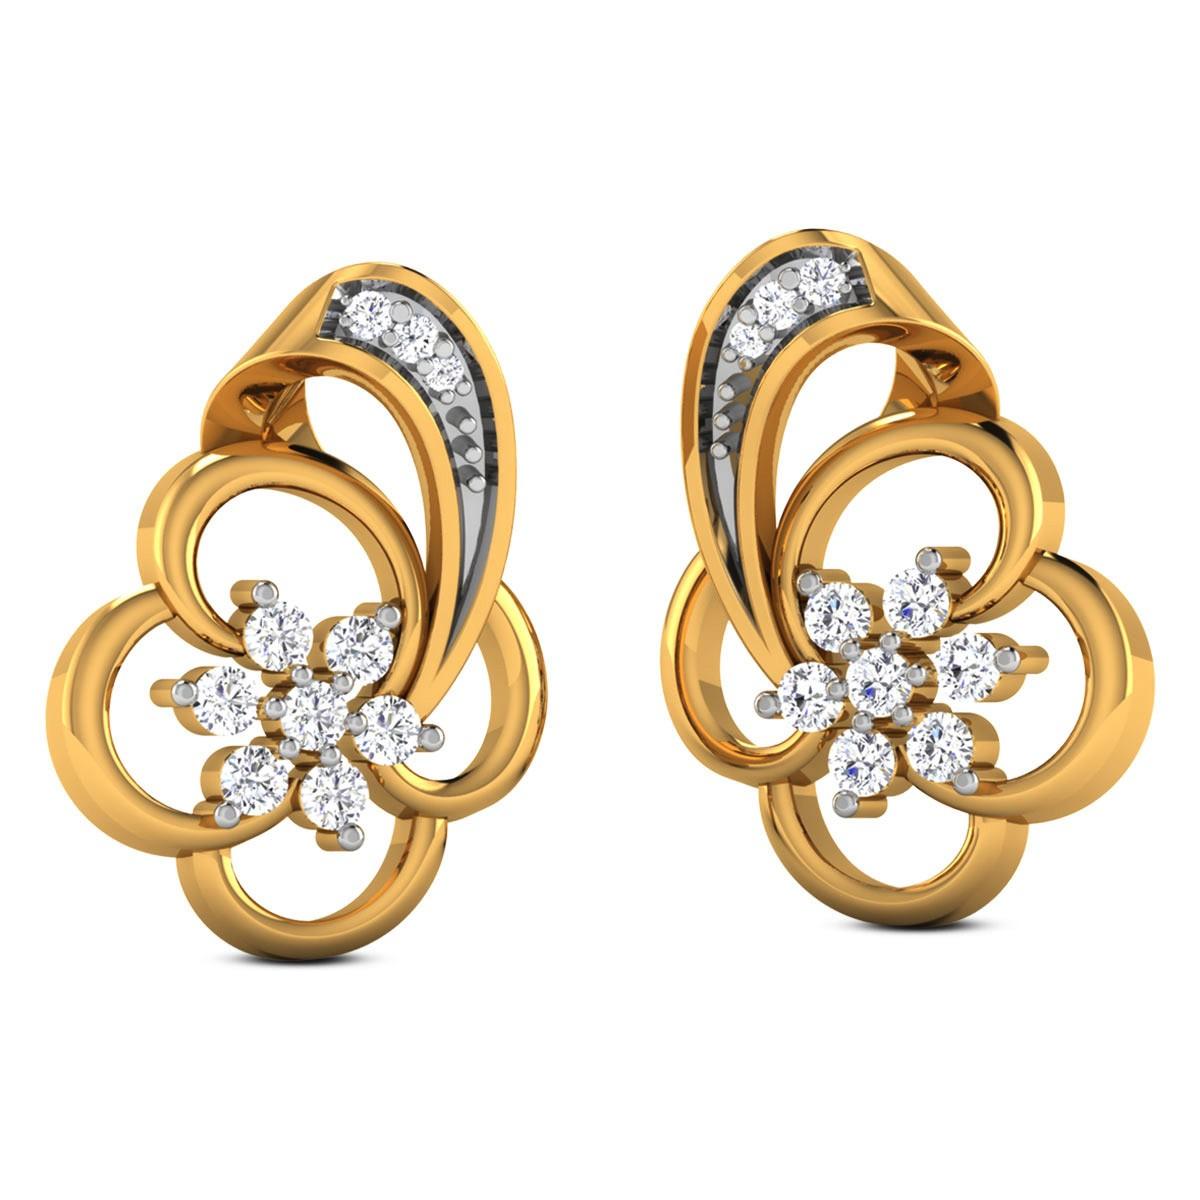 Dalmatia Diamond Stud Floral Earrings